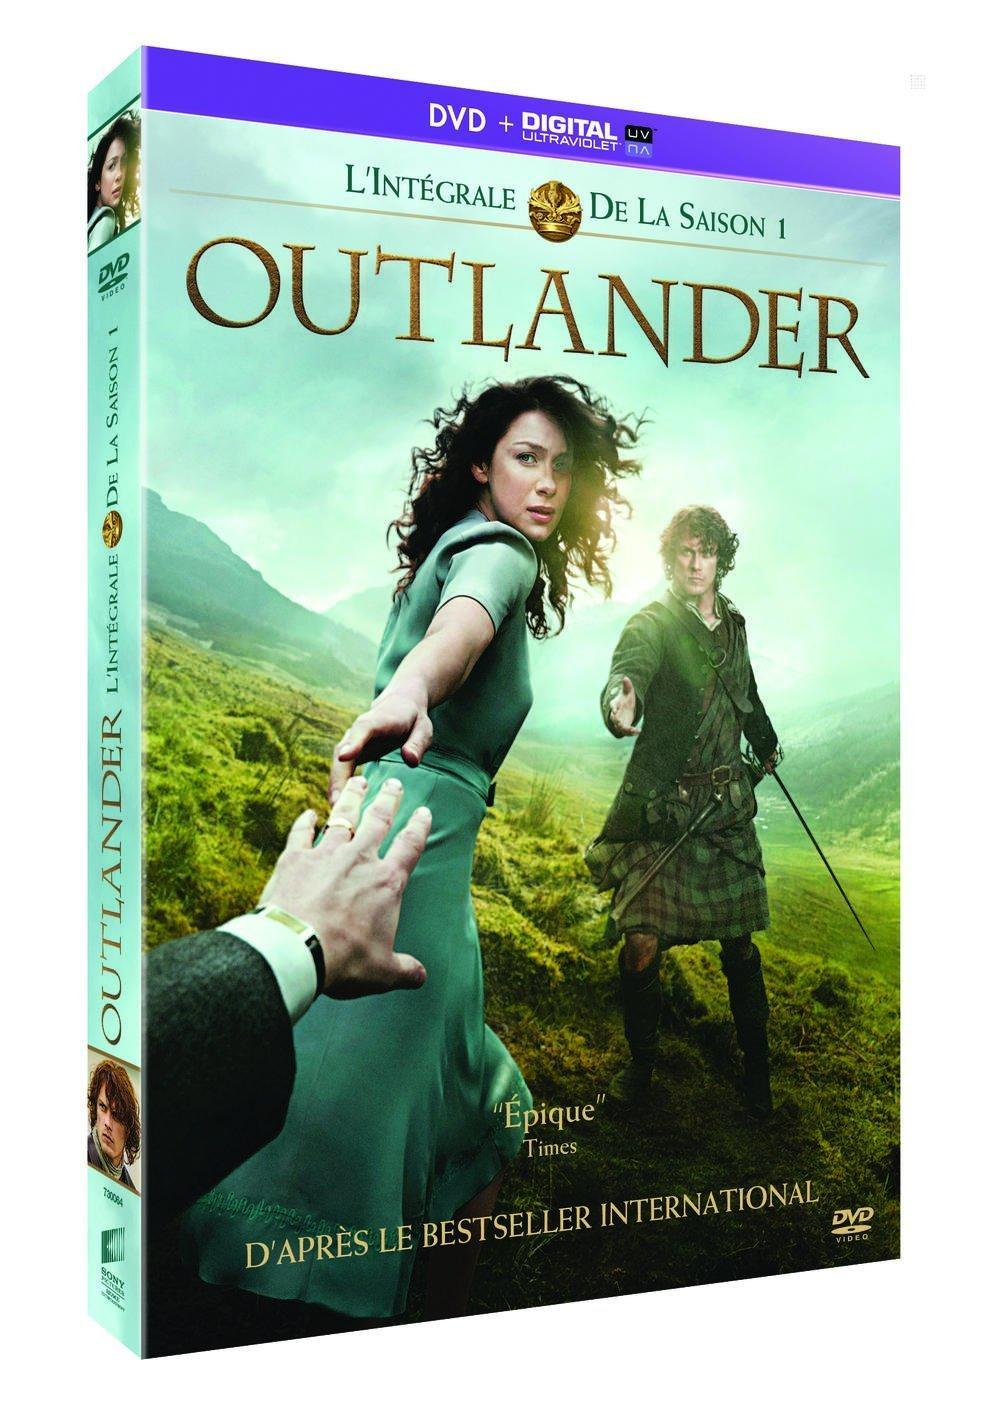 Outlander - Saison 1 (DVD + Copie digitale)